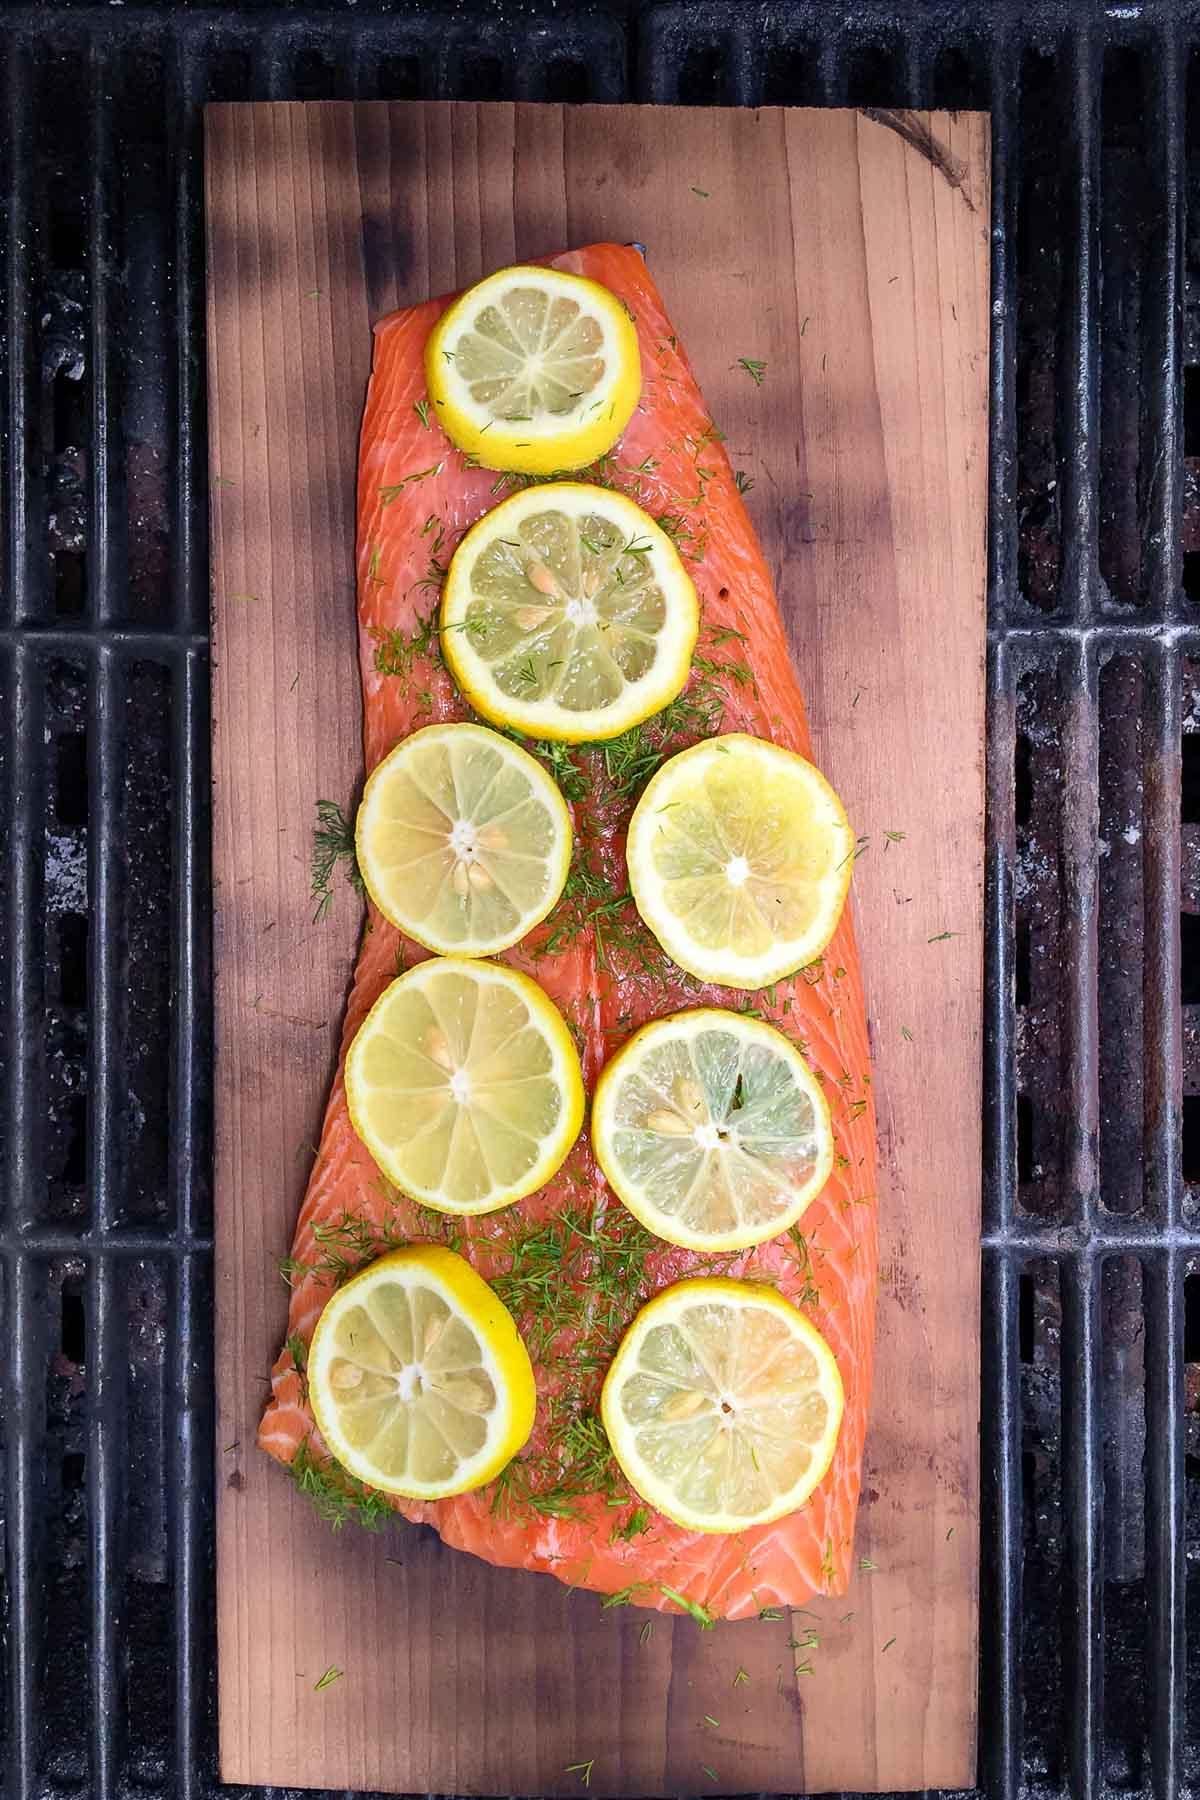 grilled cedar plank salmon on grill